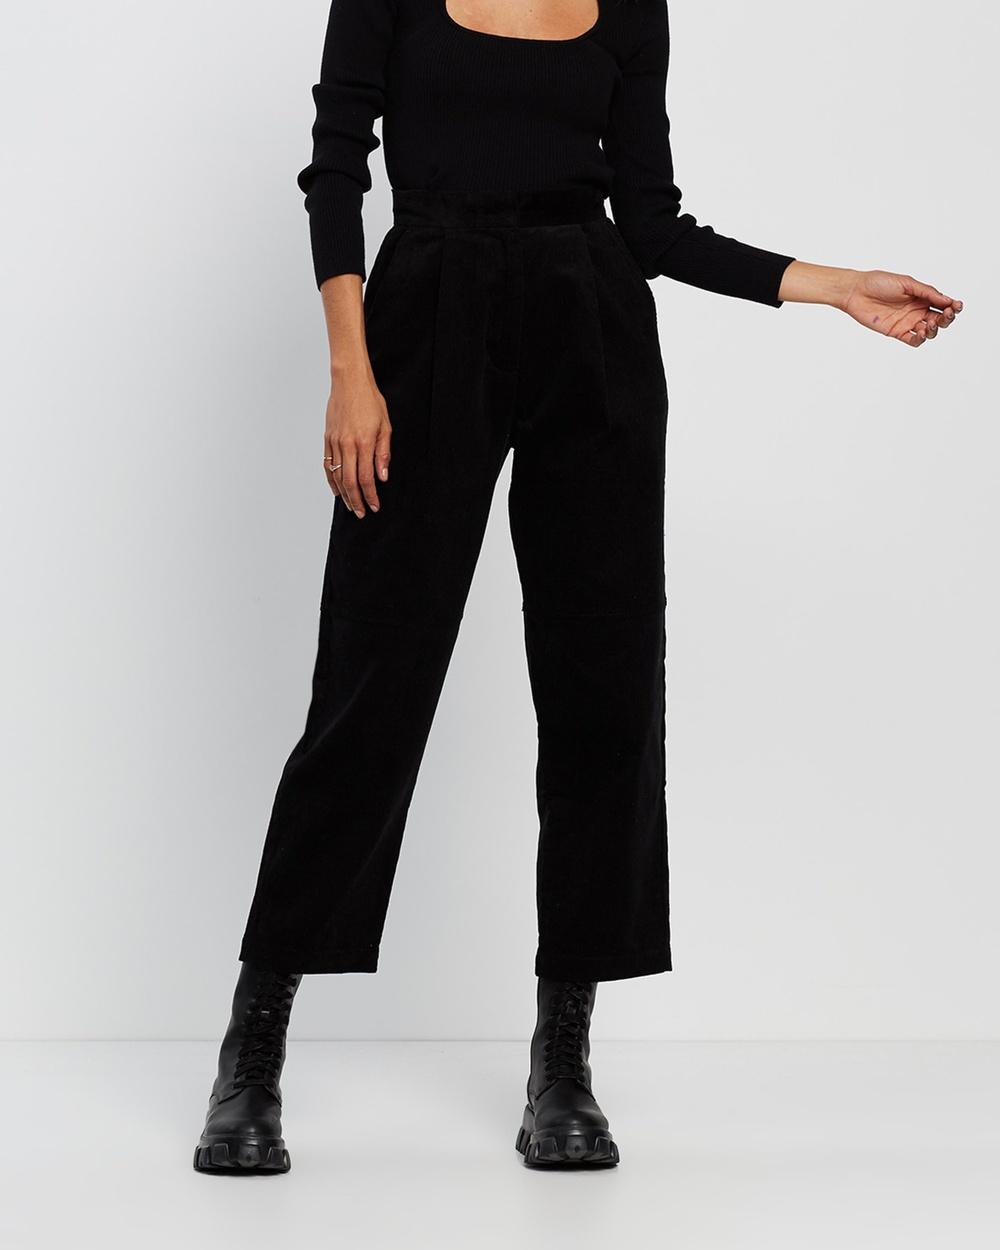 AERE Organic Cotton Cord Pants Black